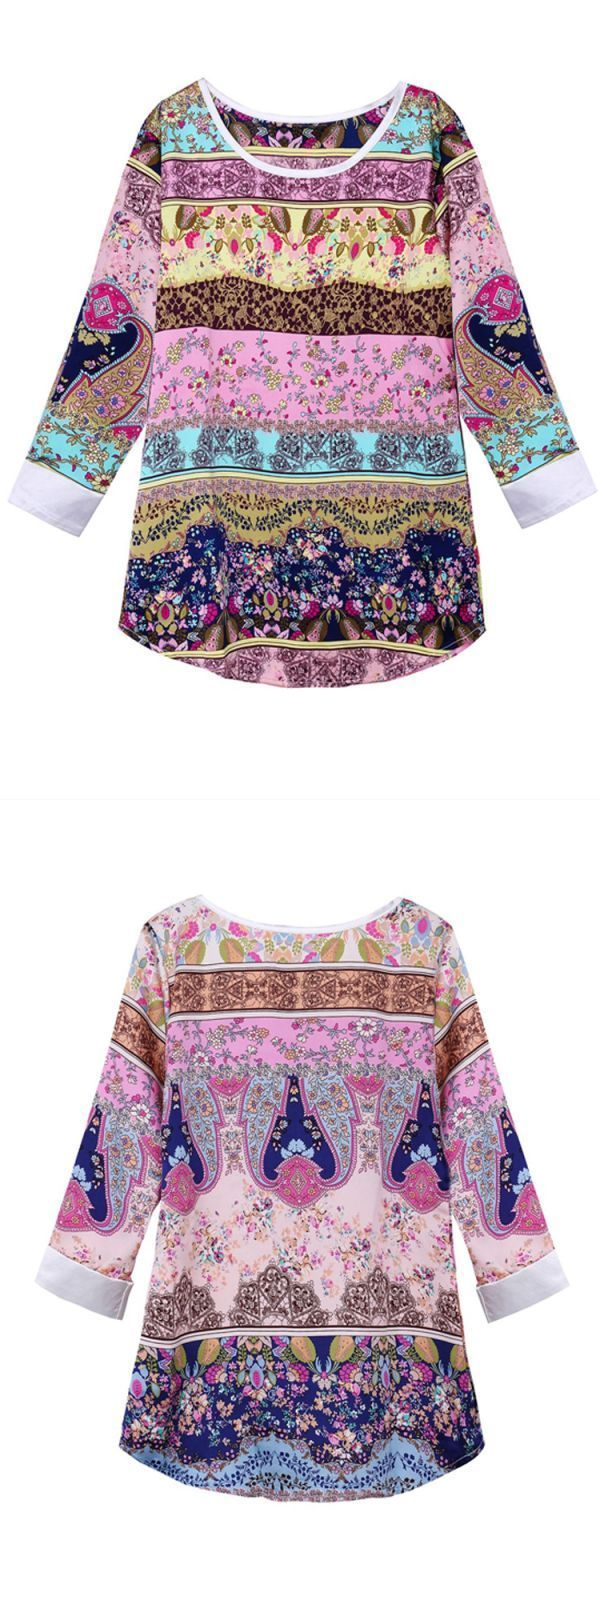 Kenar women#8217;s blouses women casual chiffon slim three quarter sleeve floral printed blouse t shirt tops #joanna #blouses #womens #shirts #neiman #marcus #womens #blouses #womens #vintage #blouses #zulily #womens #blouses